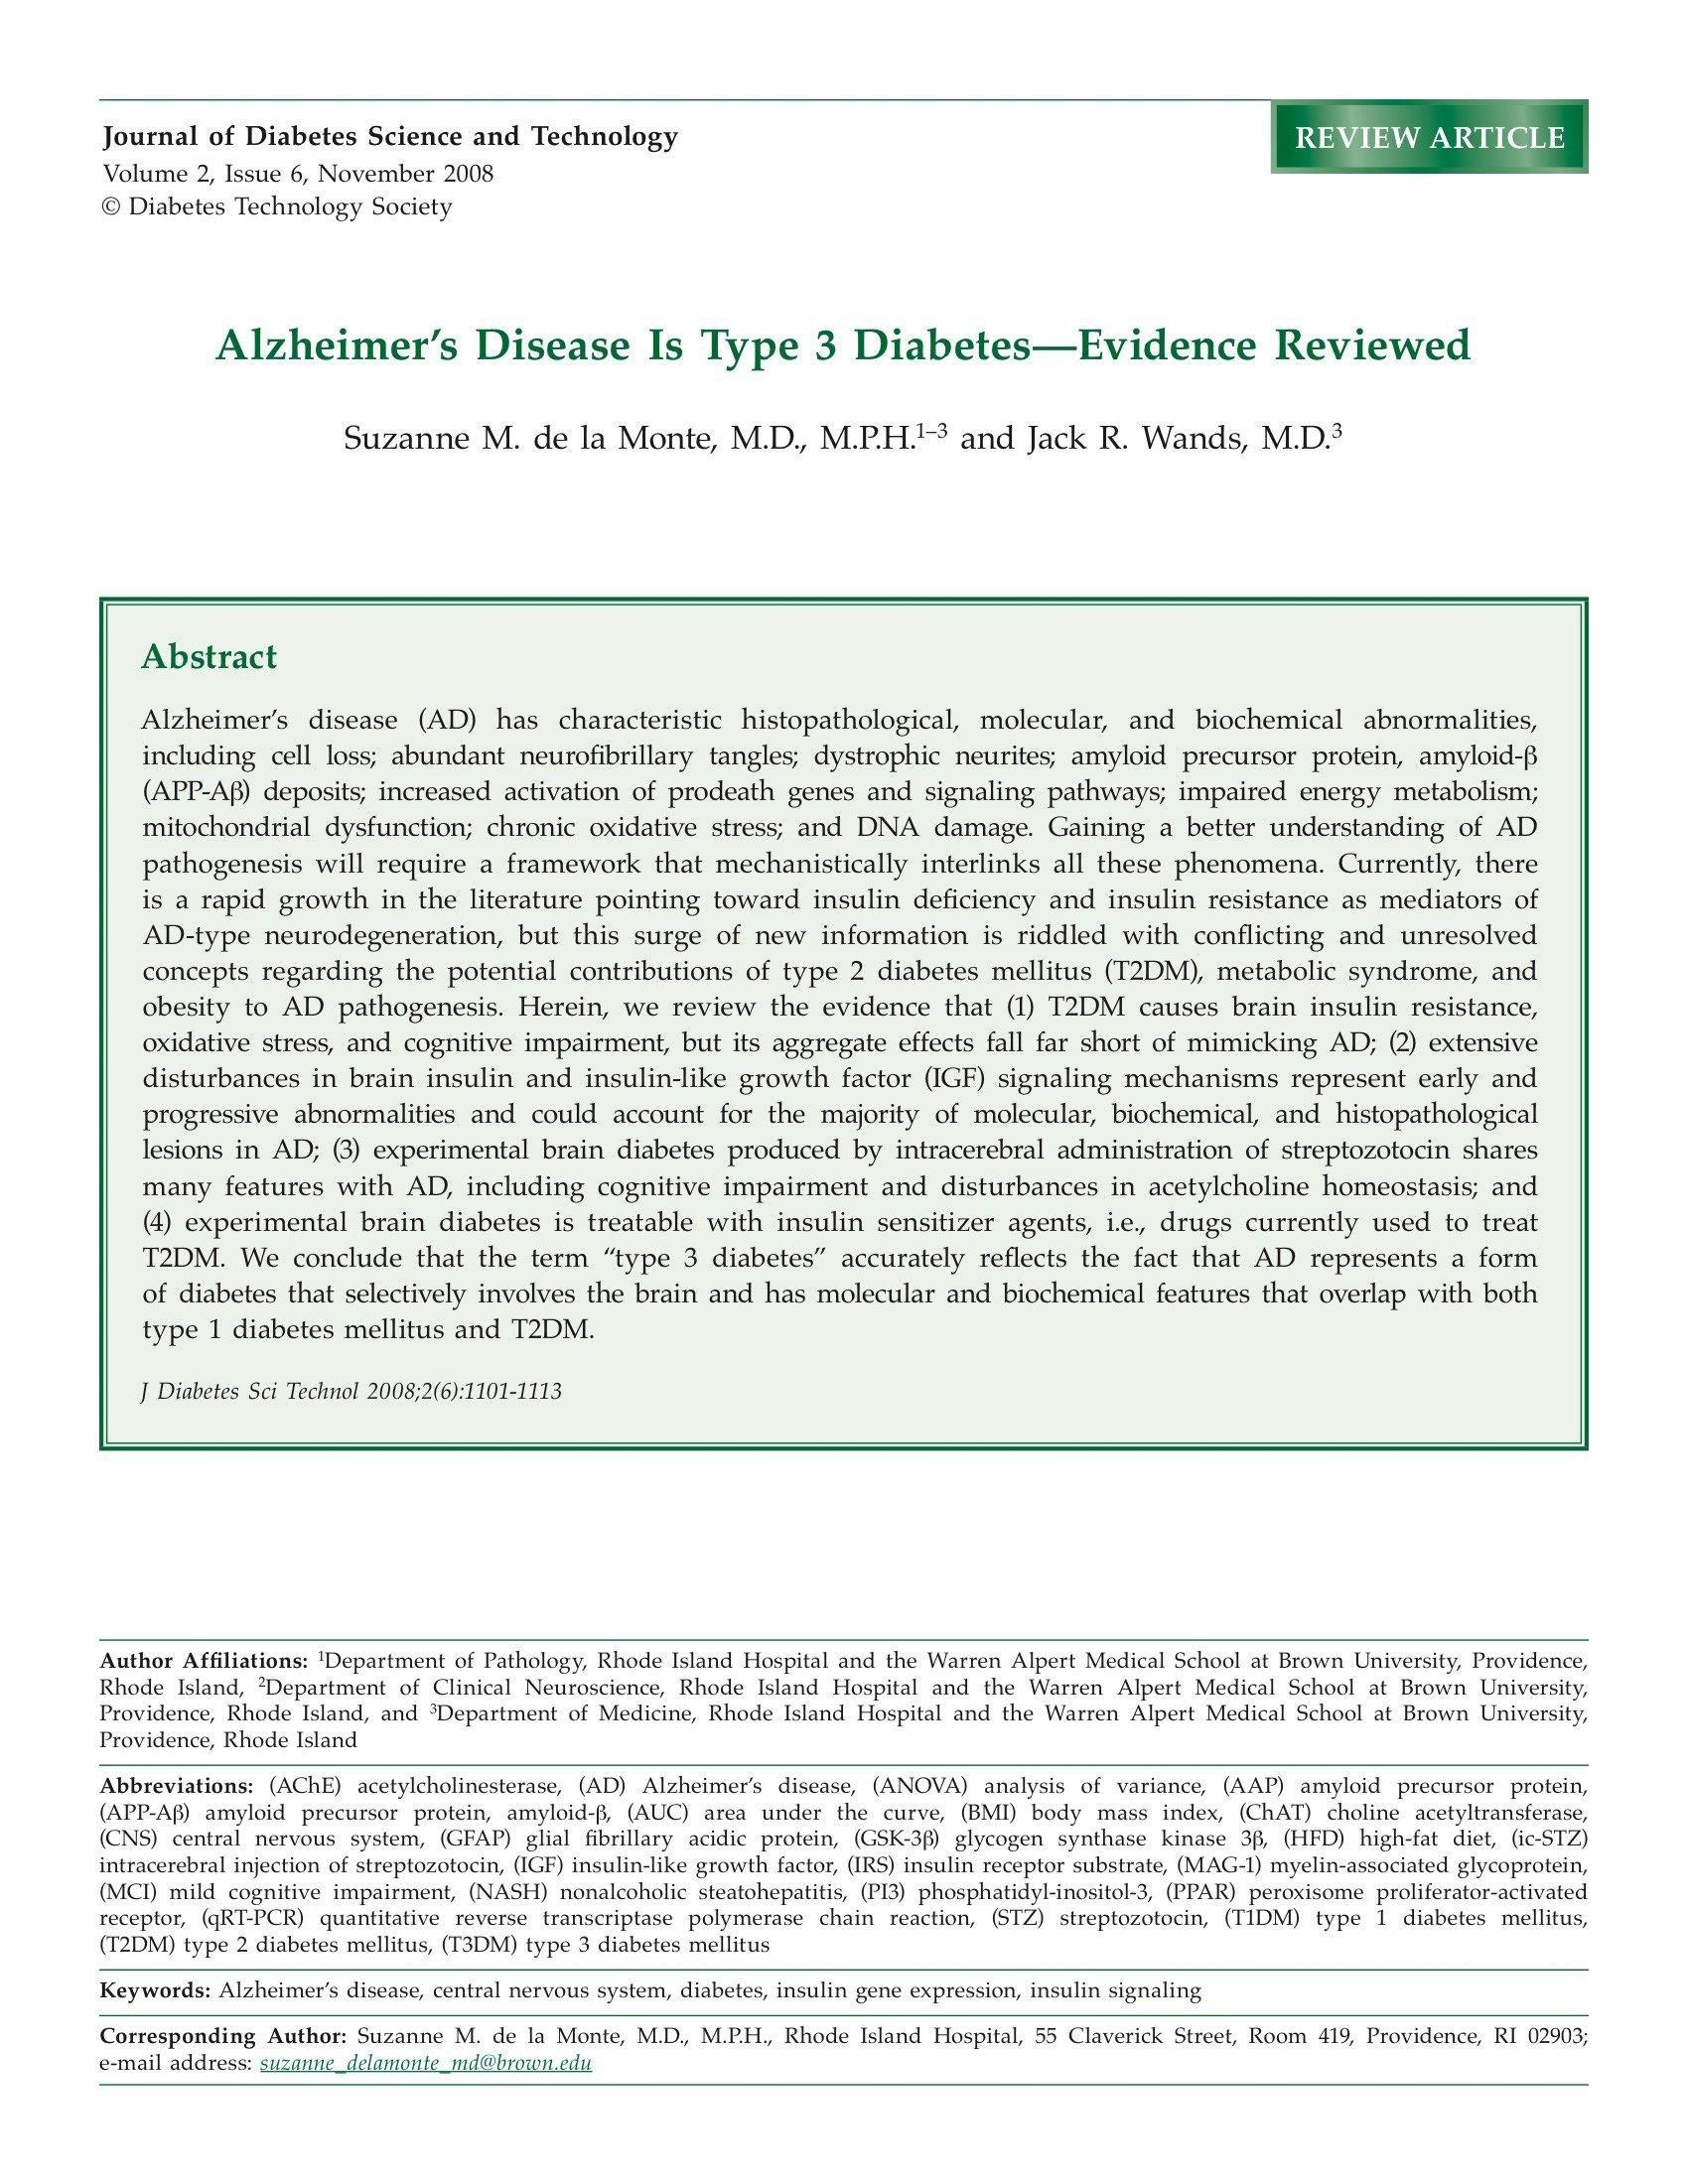 Just Read: Alzheimers Disease Is Type 3 DiabetesEvidence Reviewed